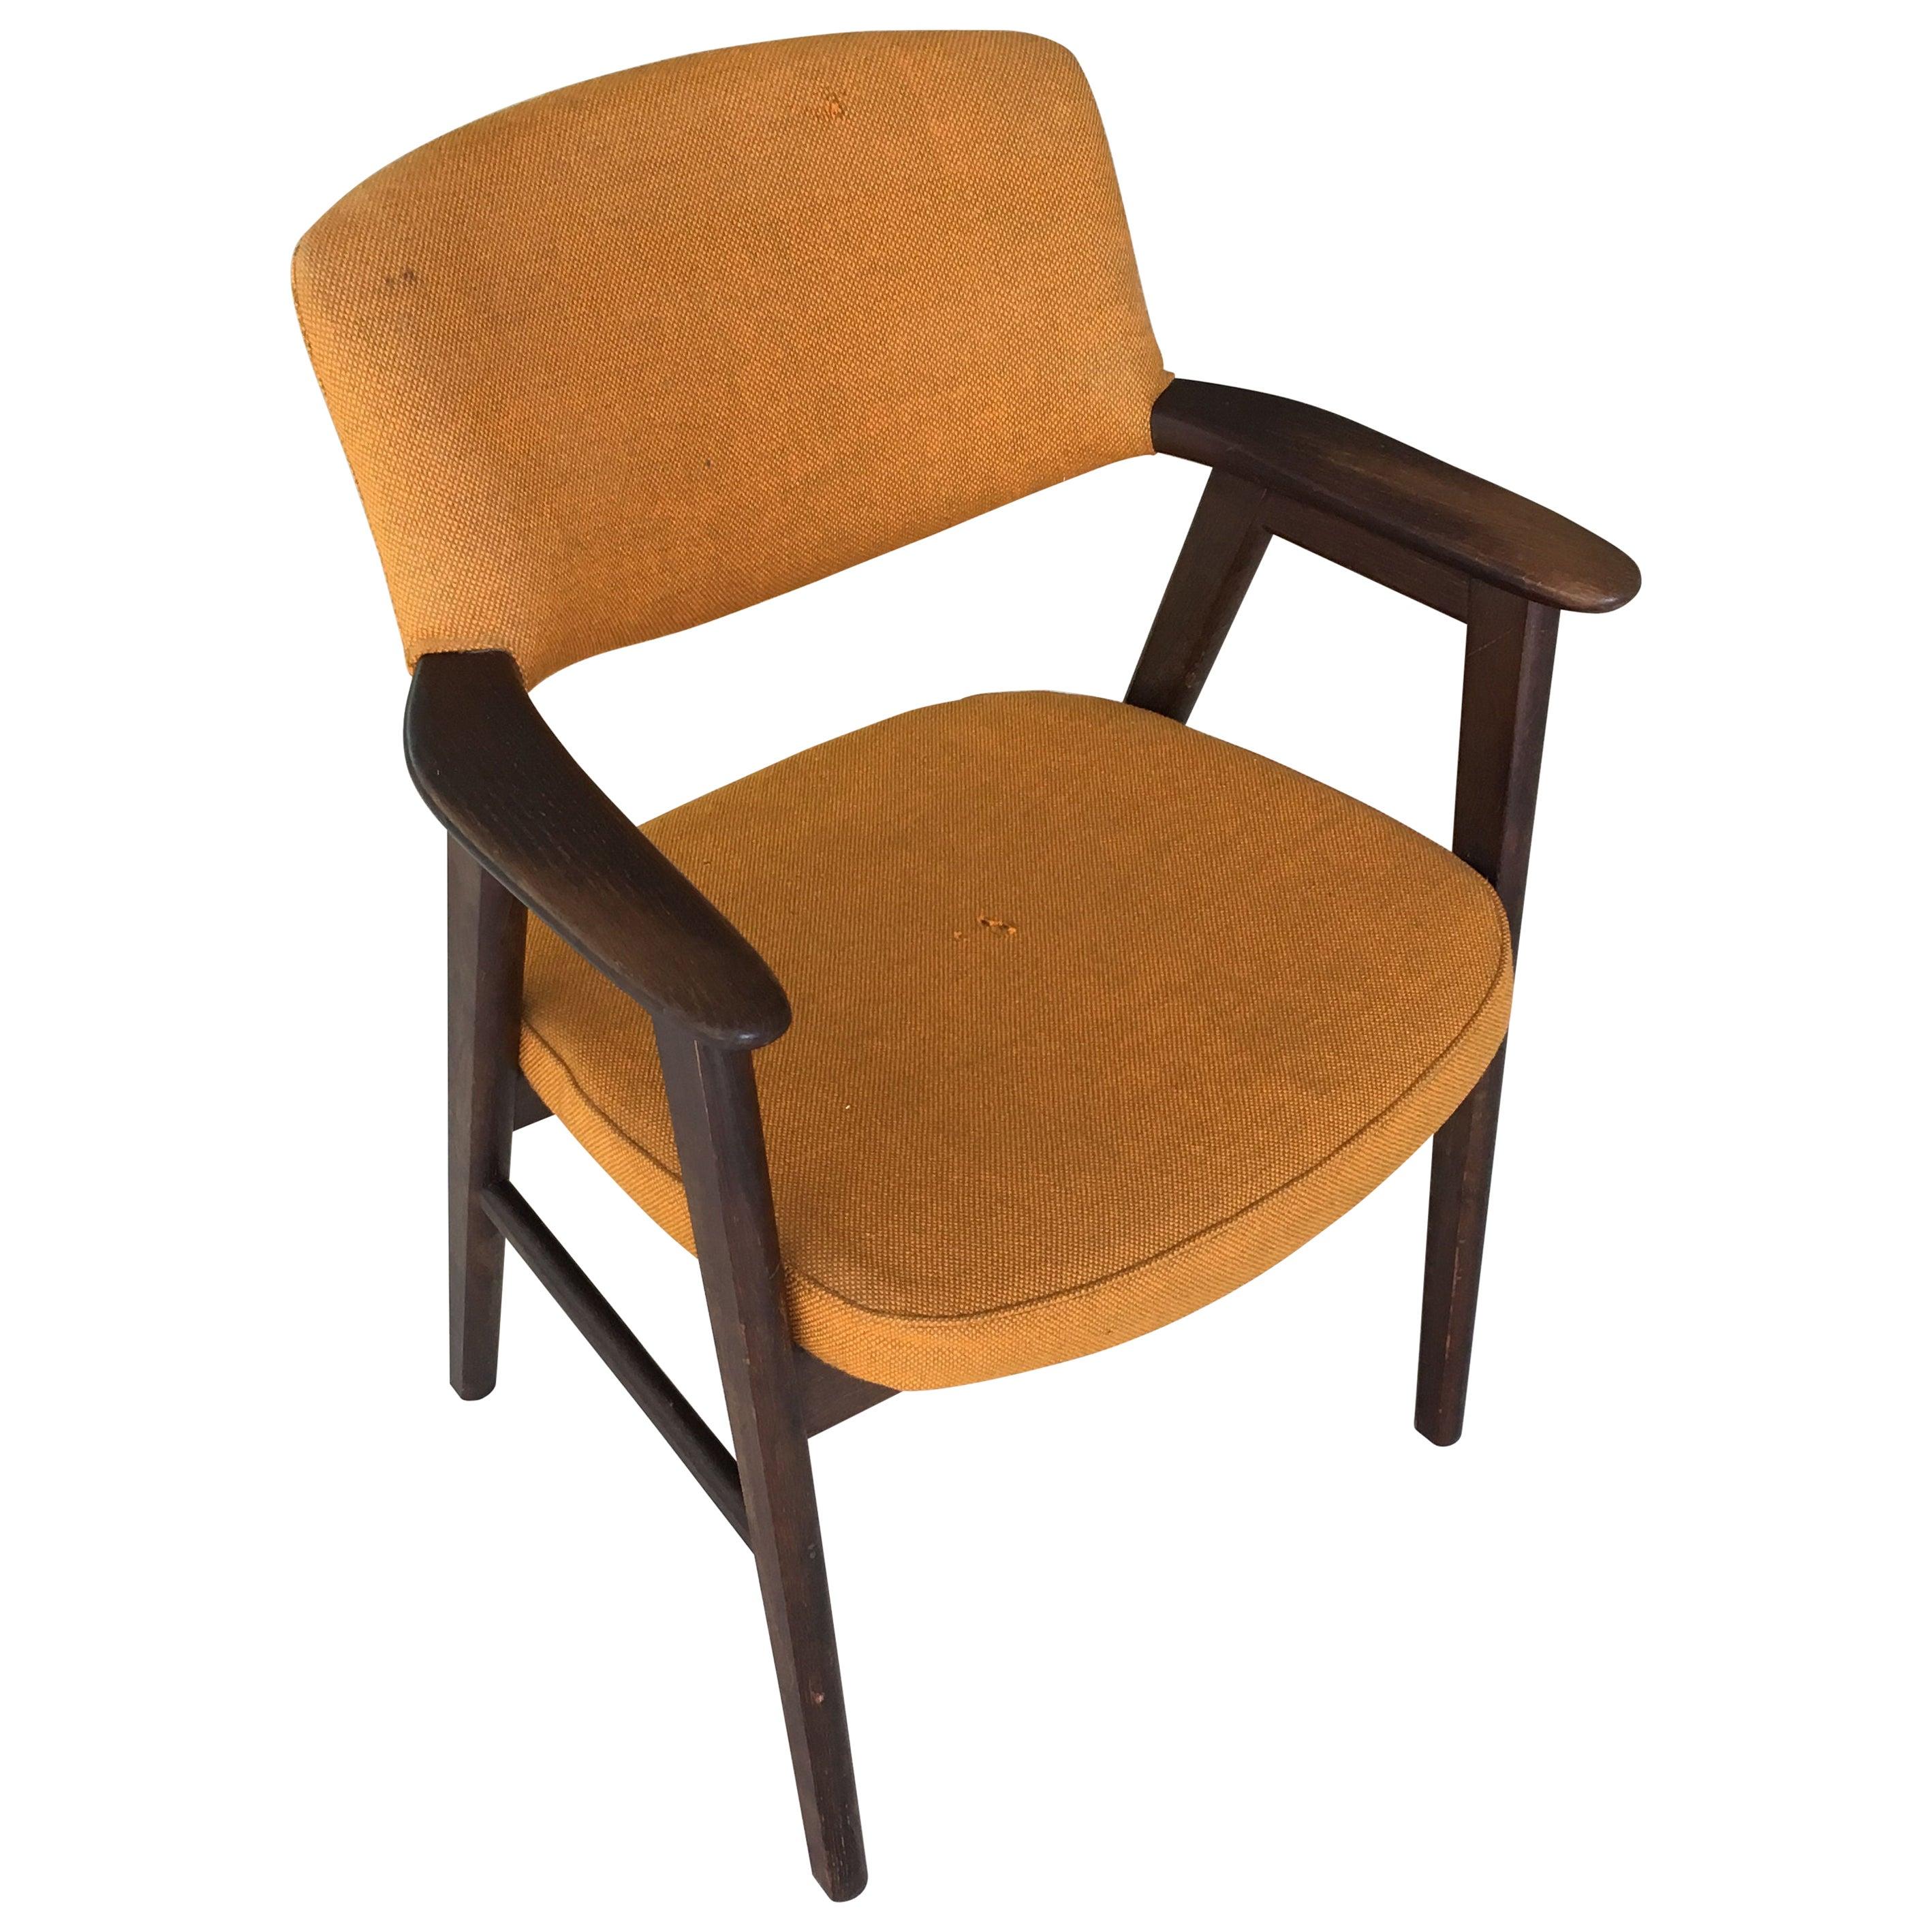 1960s Erik Kirkegaard Danish Desk Chair in Tanned Oak